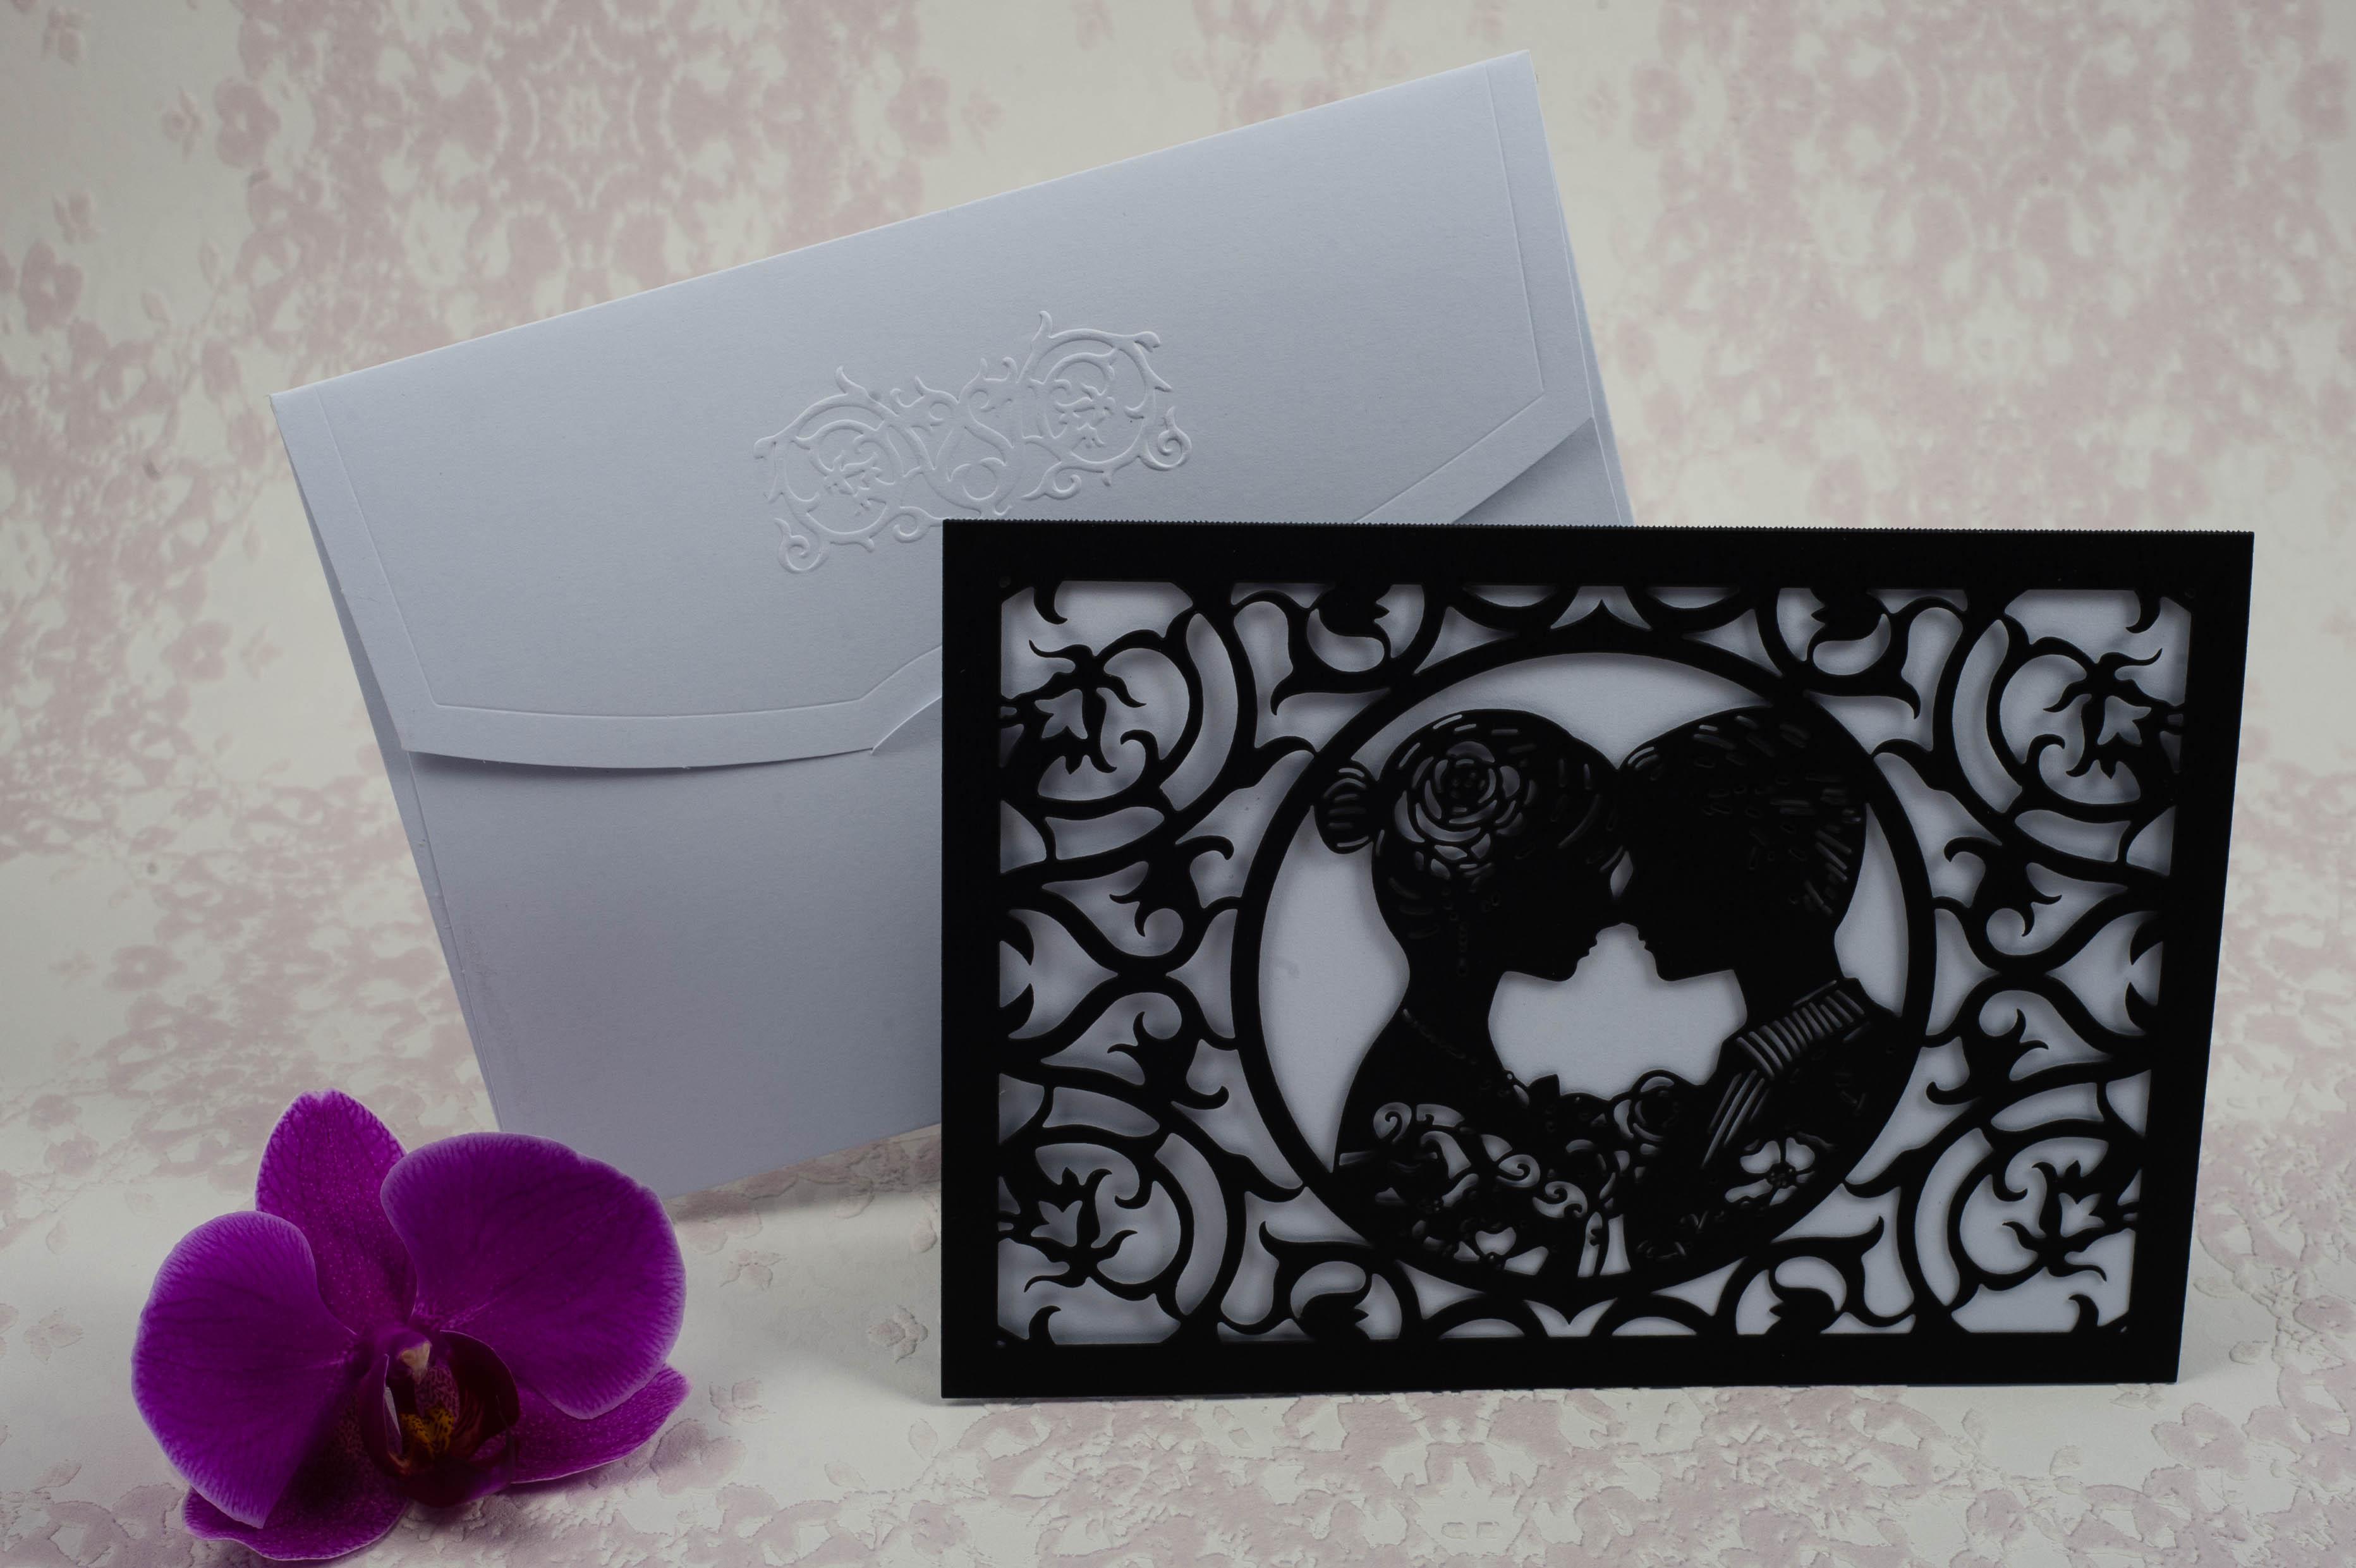 Invitatii Nunta 2194 Cele Mai Cumparate Invitatii